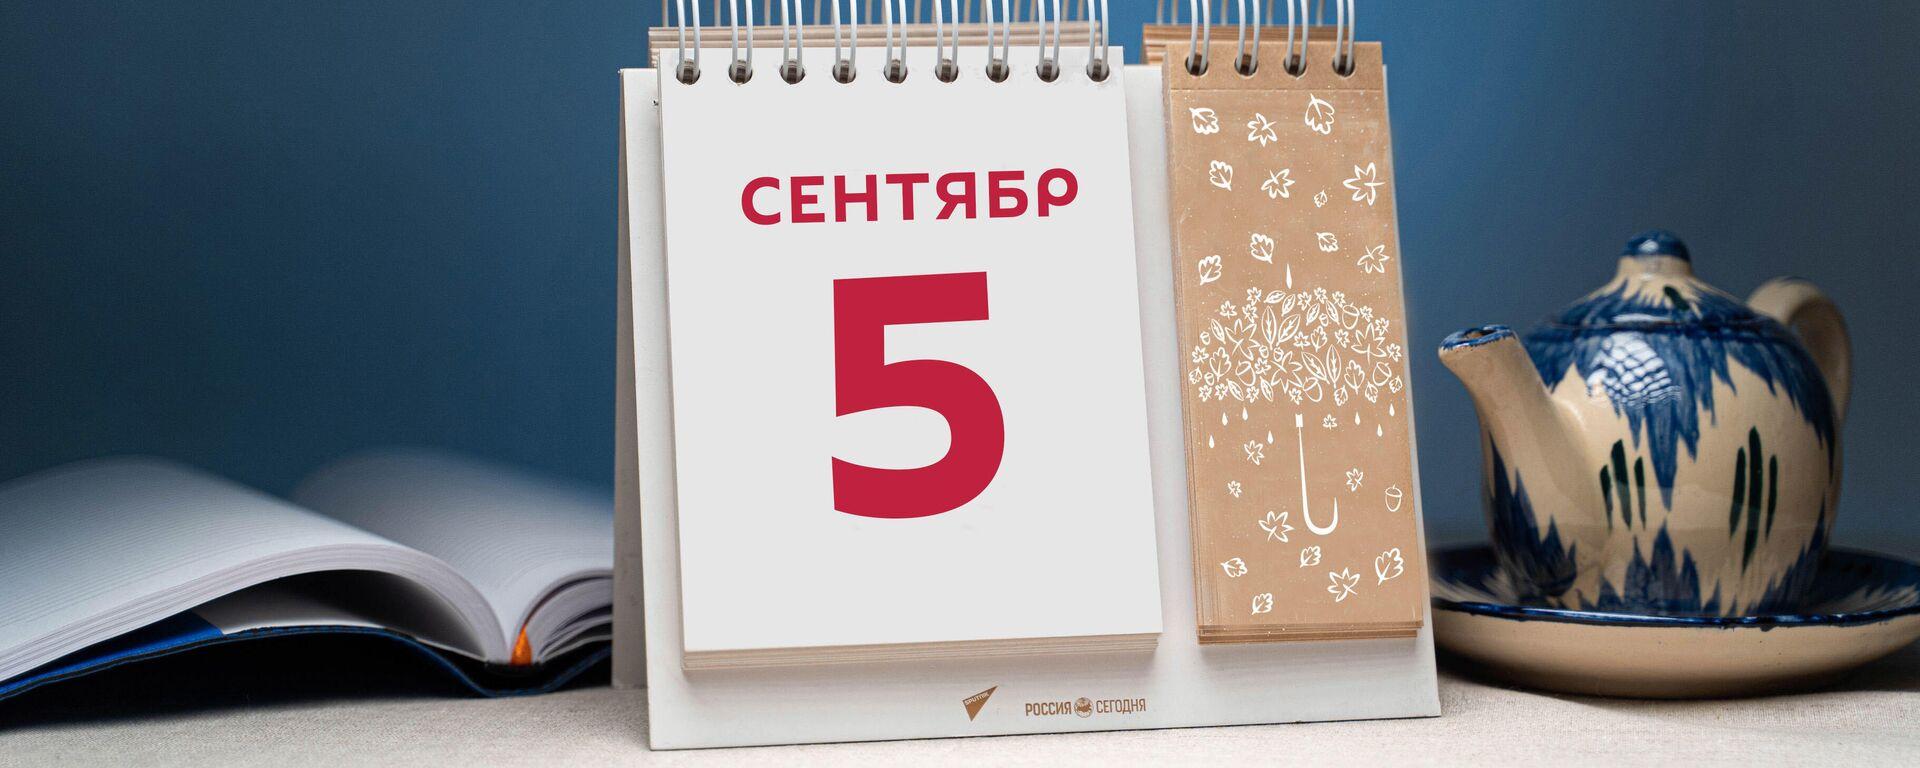 День 5 сентября - Sputnik Тоҷикистон, 1920, 05.09.2021